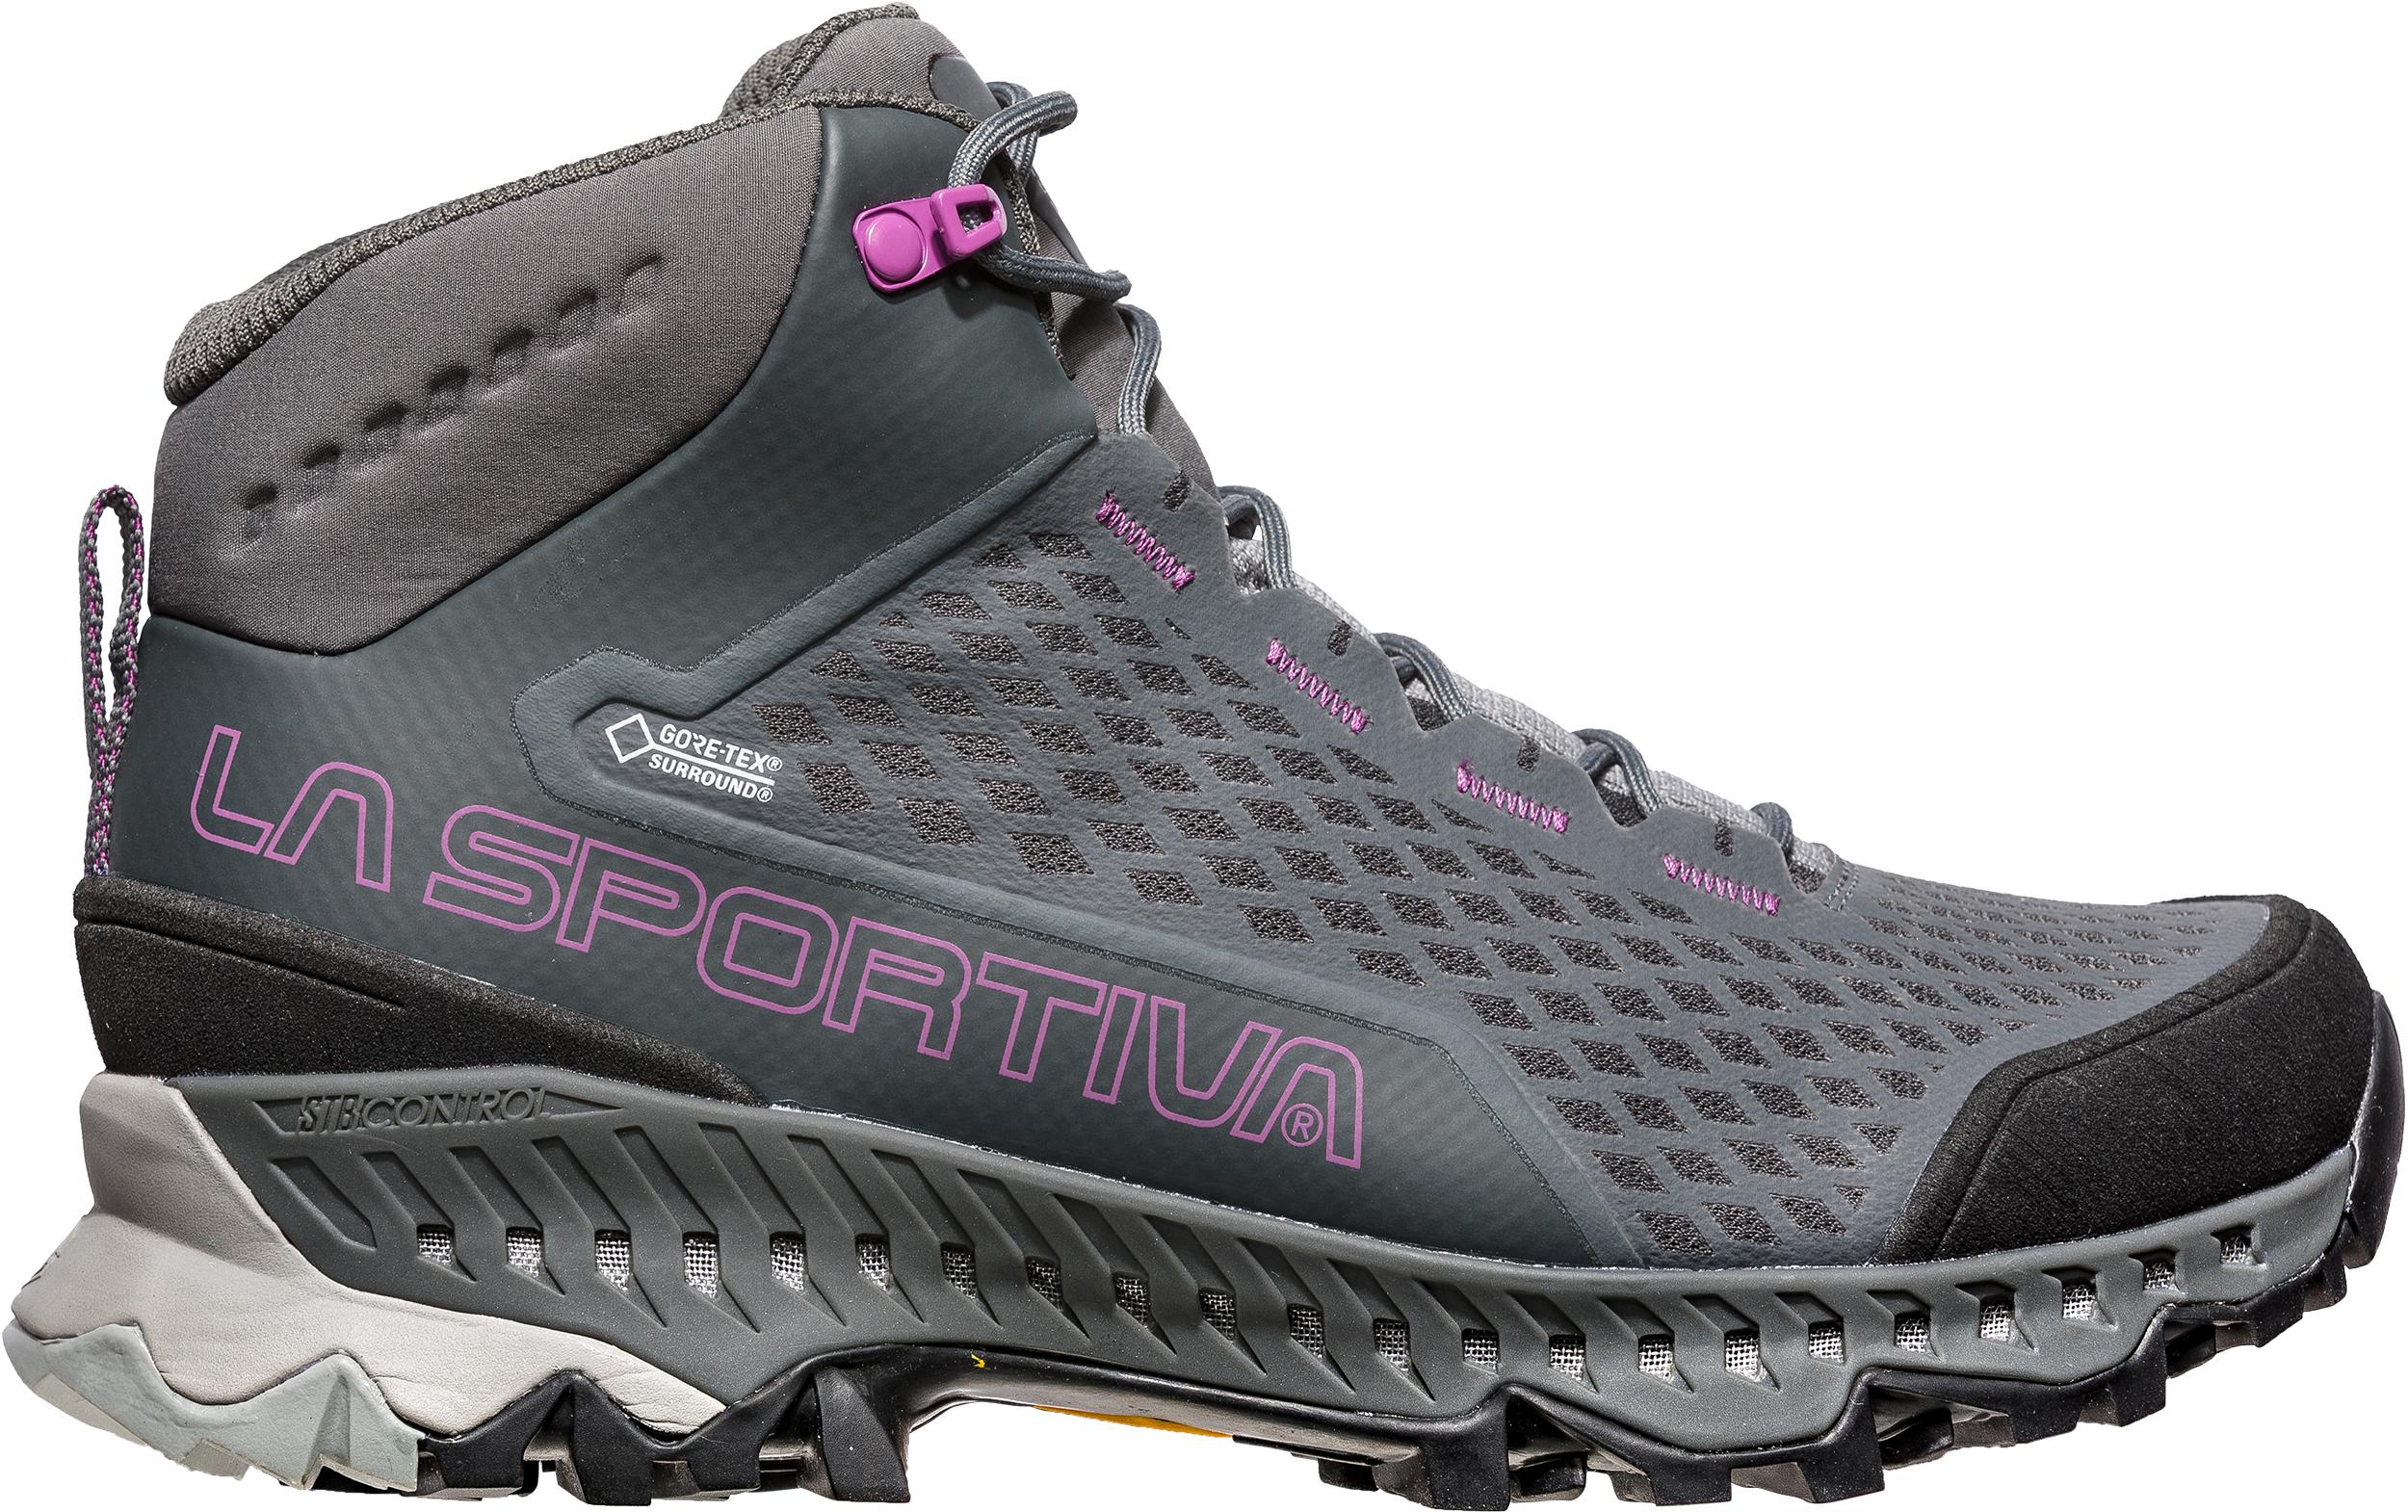 1752edff2b8 La Sportiva Stream GTX Surround Light Trail Shoes - Women's